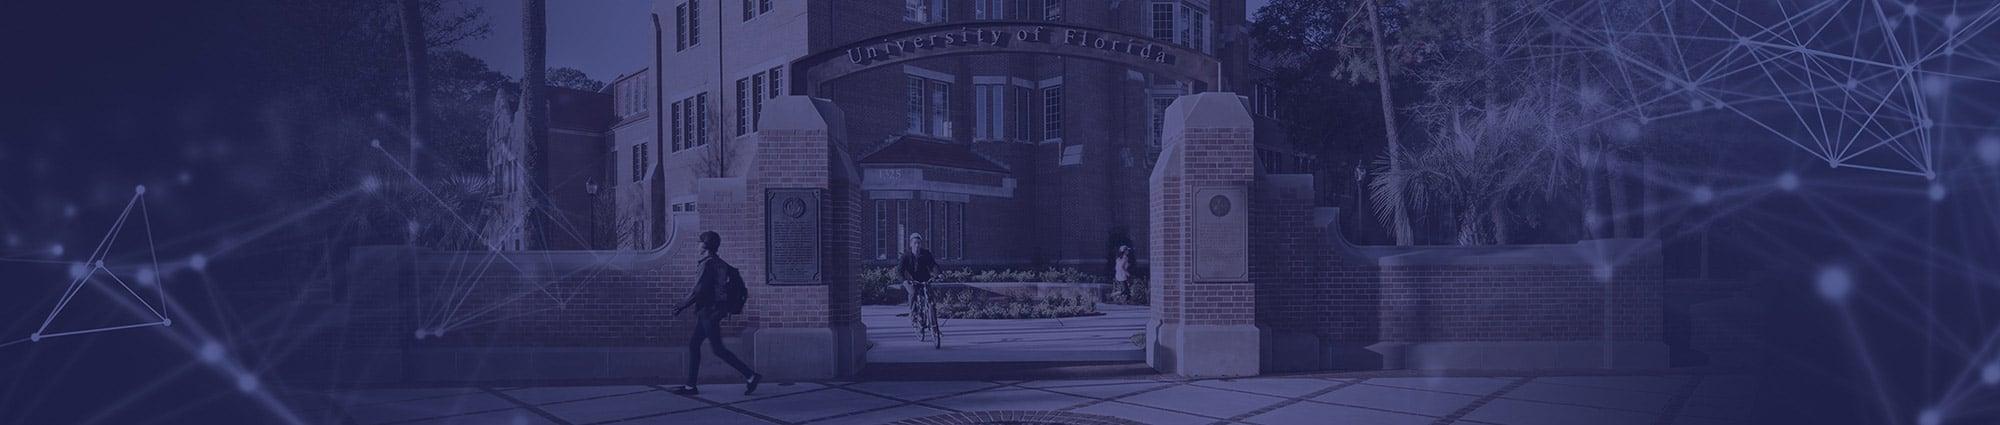 University of Florida Northeast Gateway by Heavener Hall